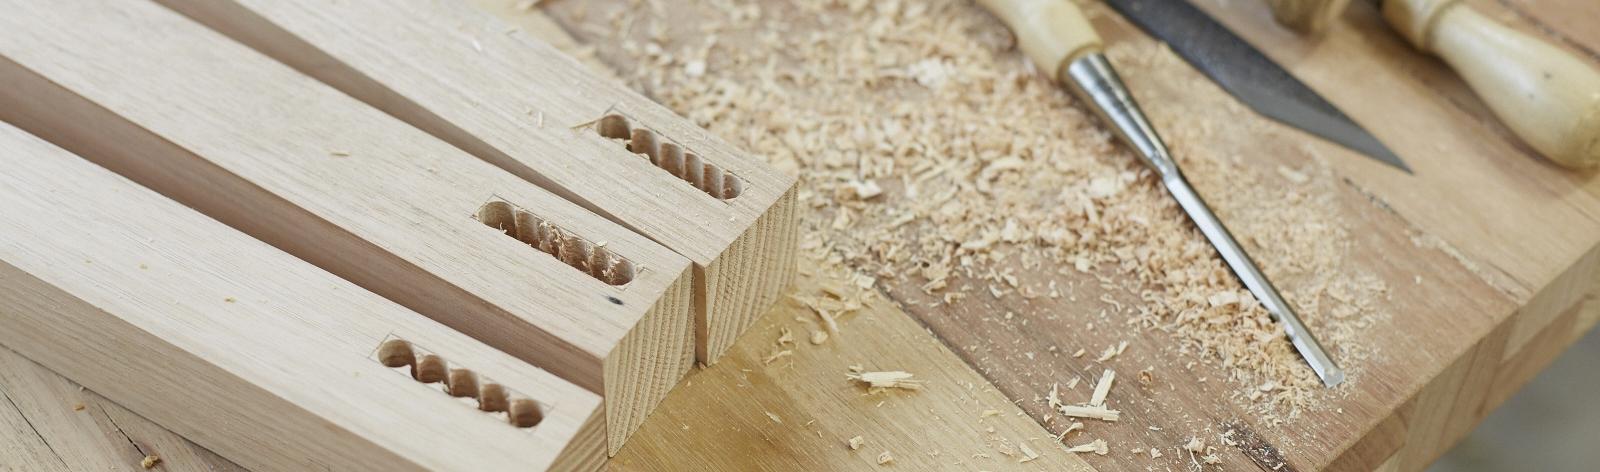 melbourne school of woodcraft 2